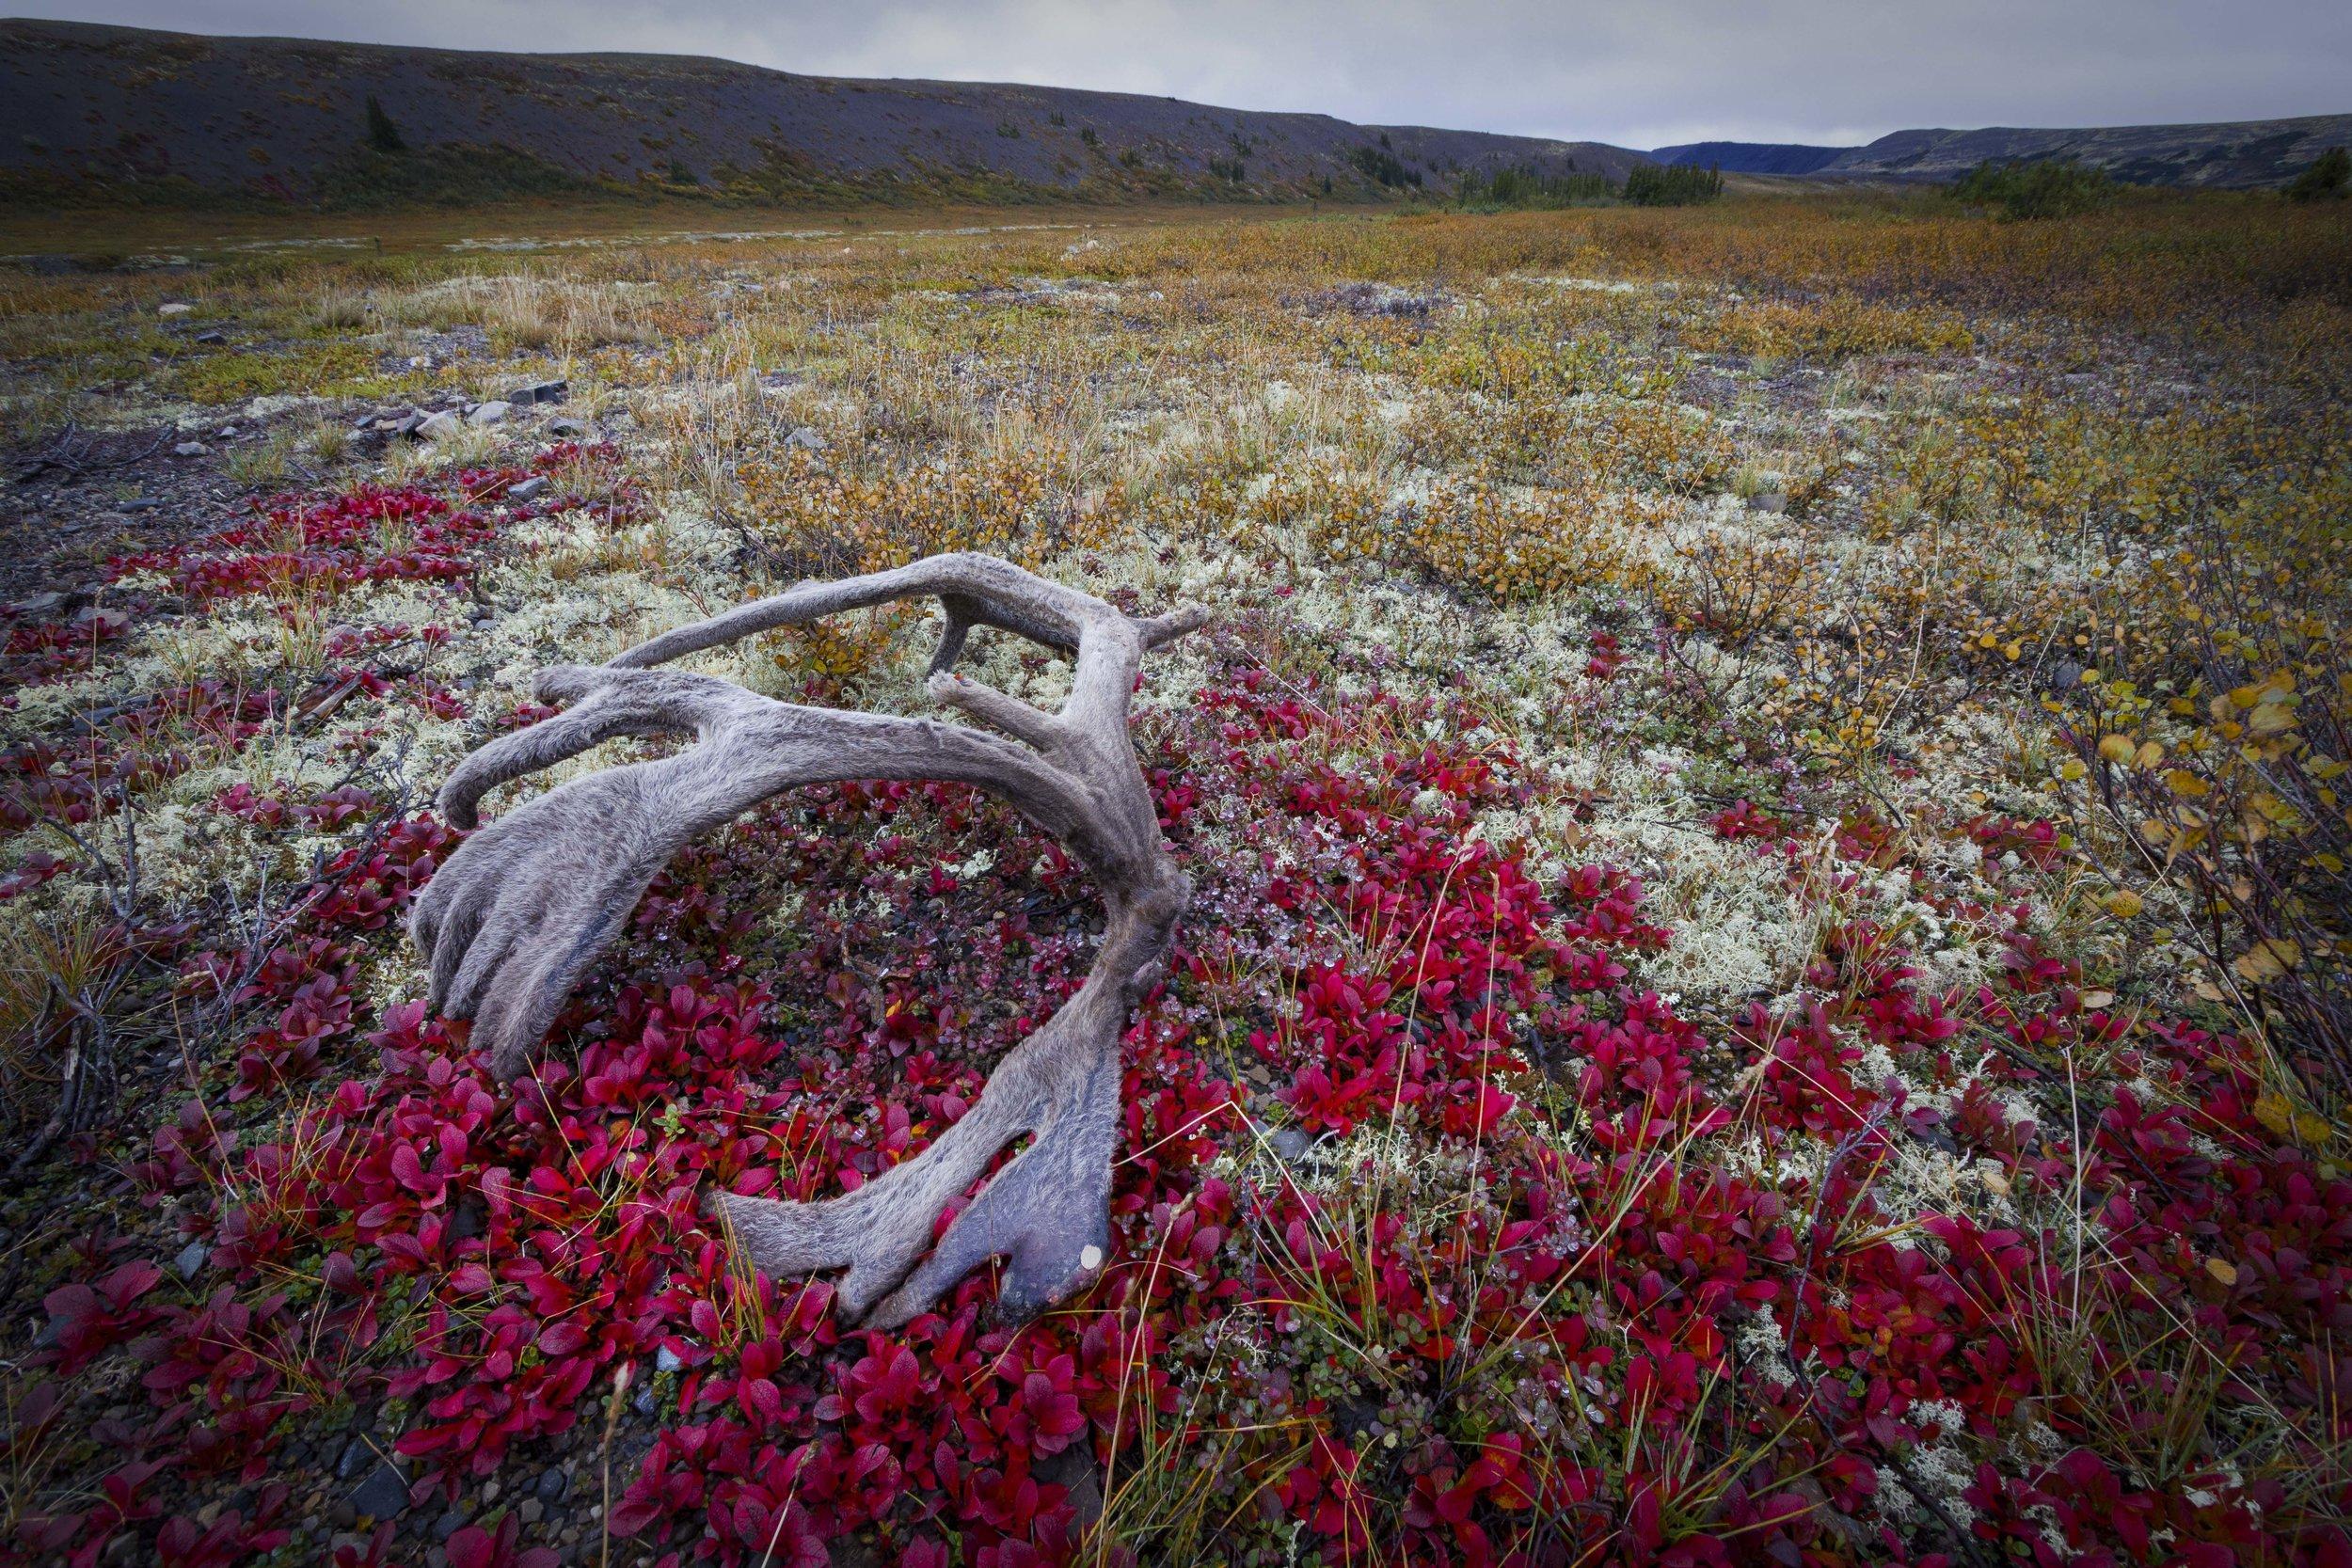 Dempster Highway, Roadtrip, Landscape, Arctic, rob gubiani, Tundra, Tombstone, Tuktoyuktuk, Inuvik, Dempster, Yukon, travel, wanderlust, caribou, antler, cast, velvet,